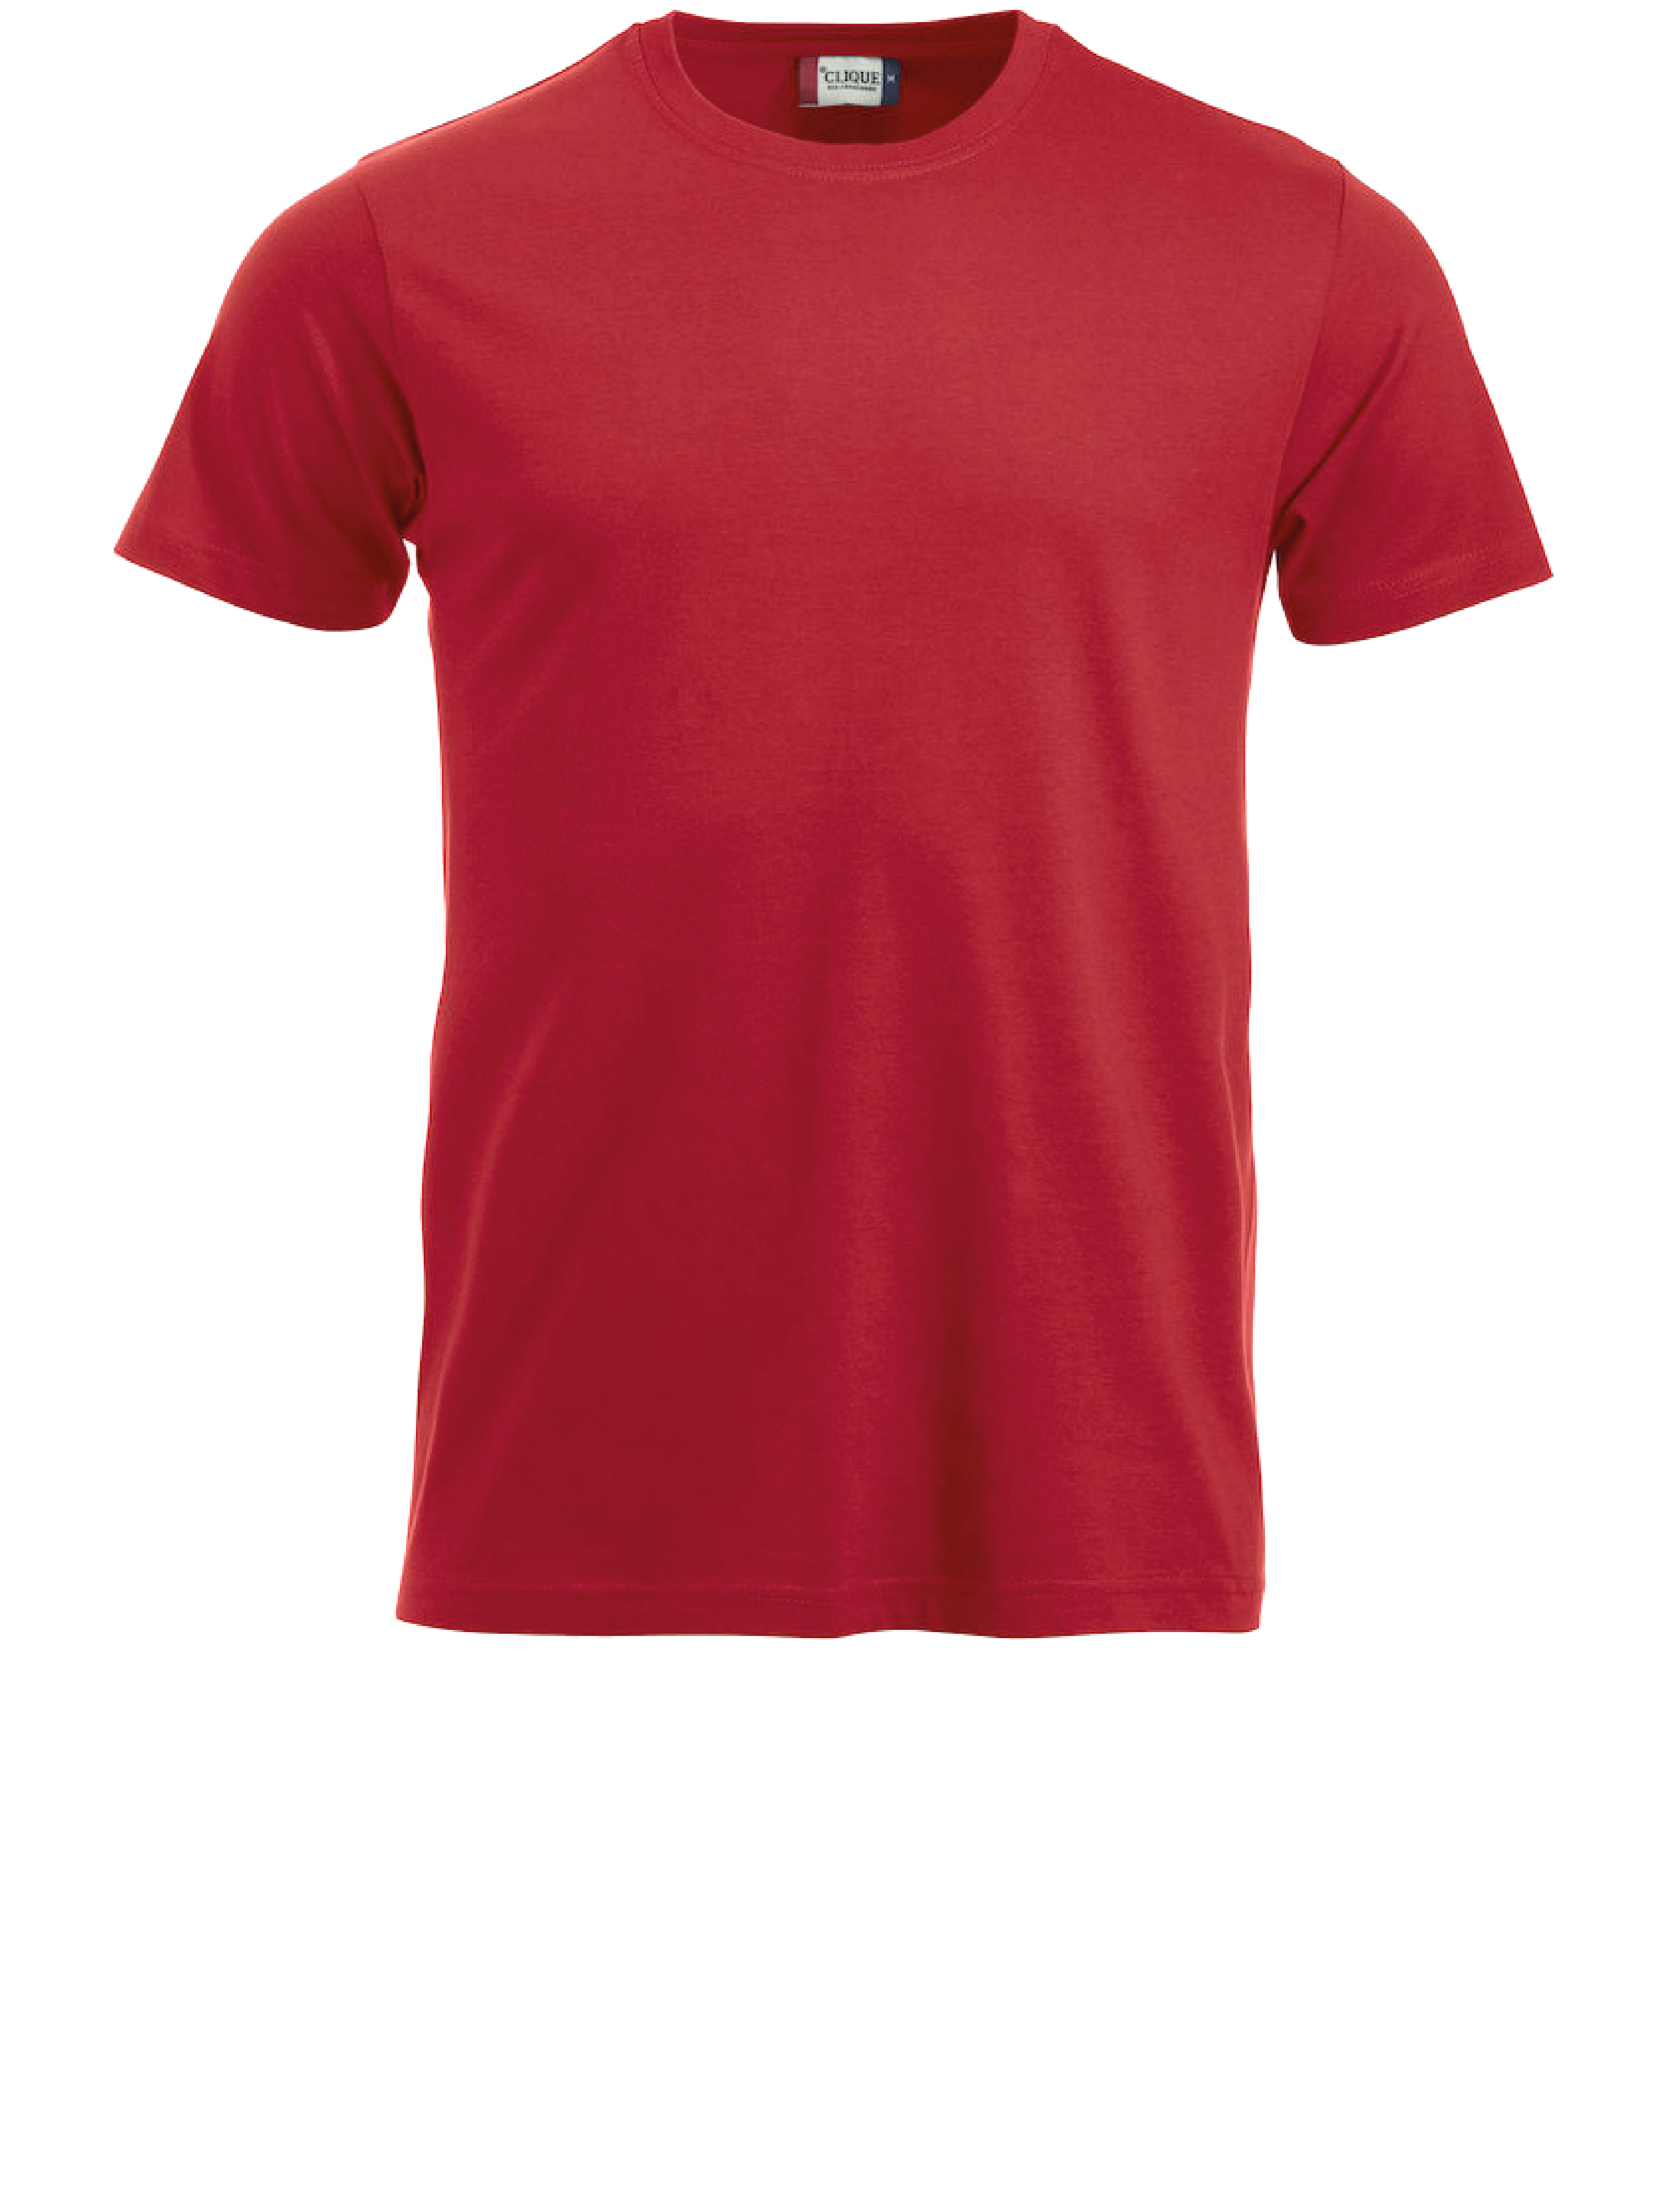 shirt rot-01.png